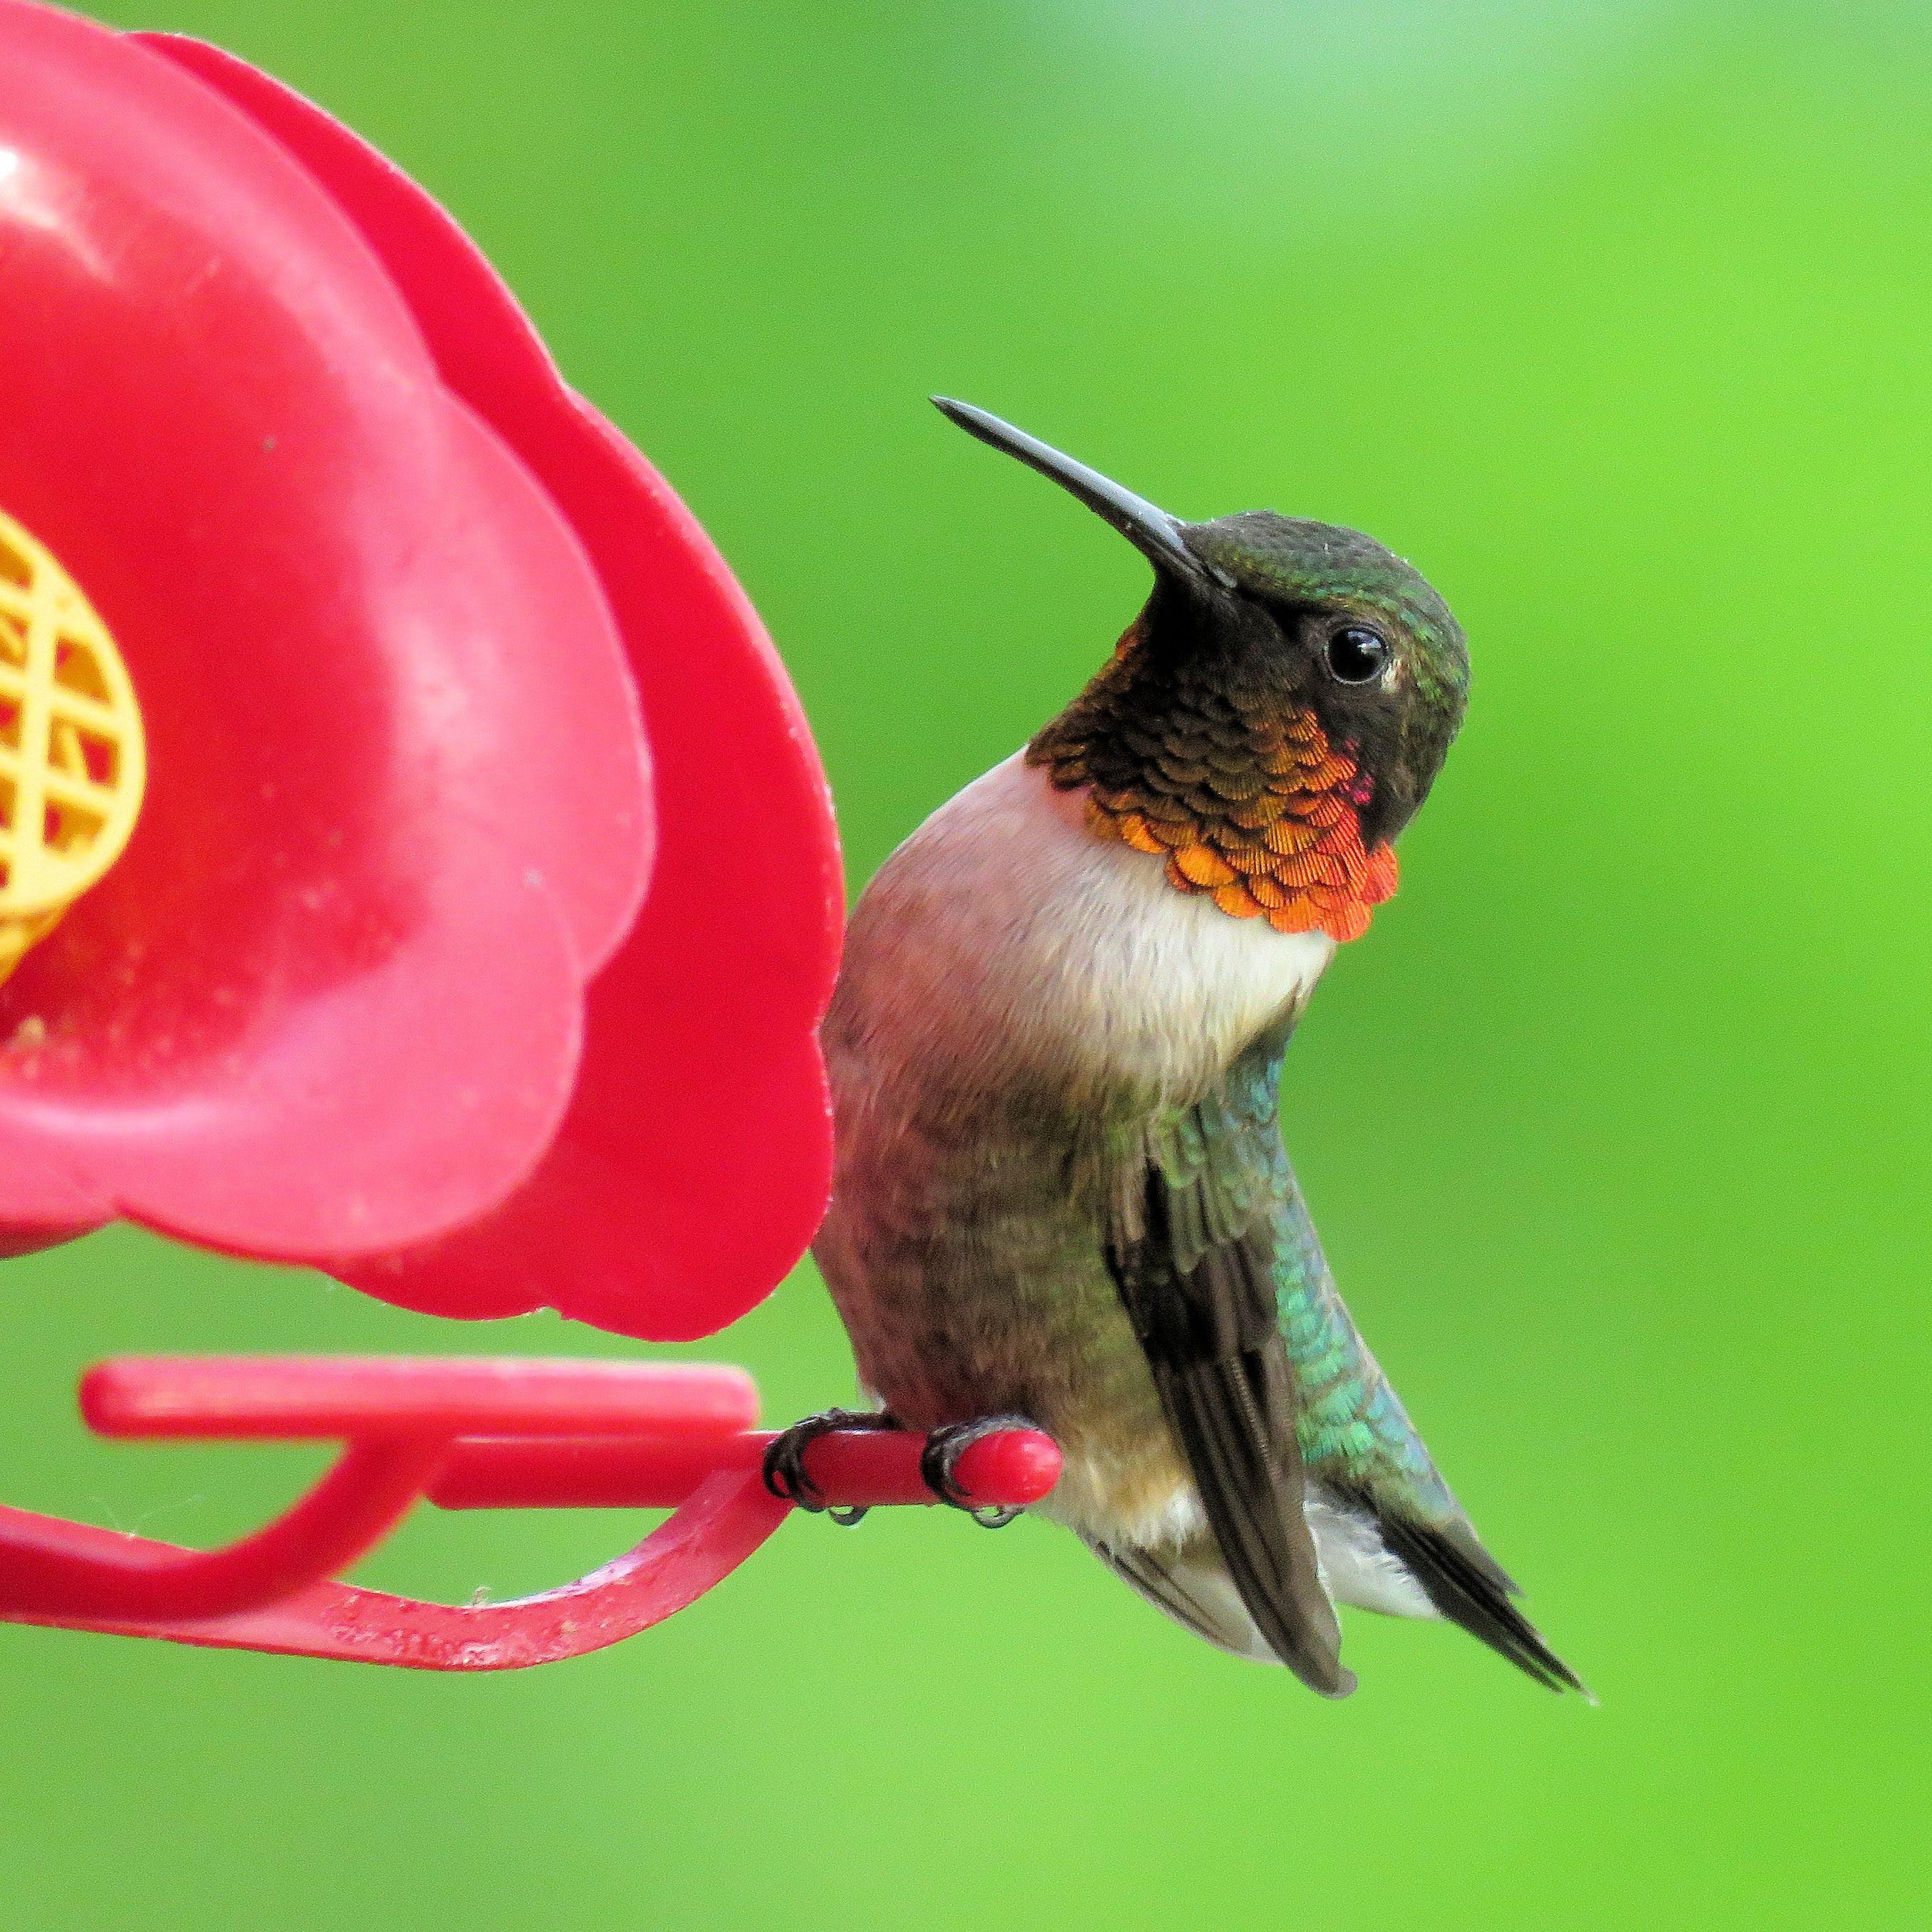 Free stock photo of bird, hummingbird, ruby throated hummingbird, feeder